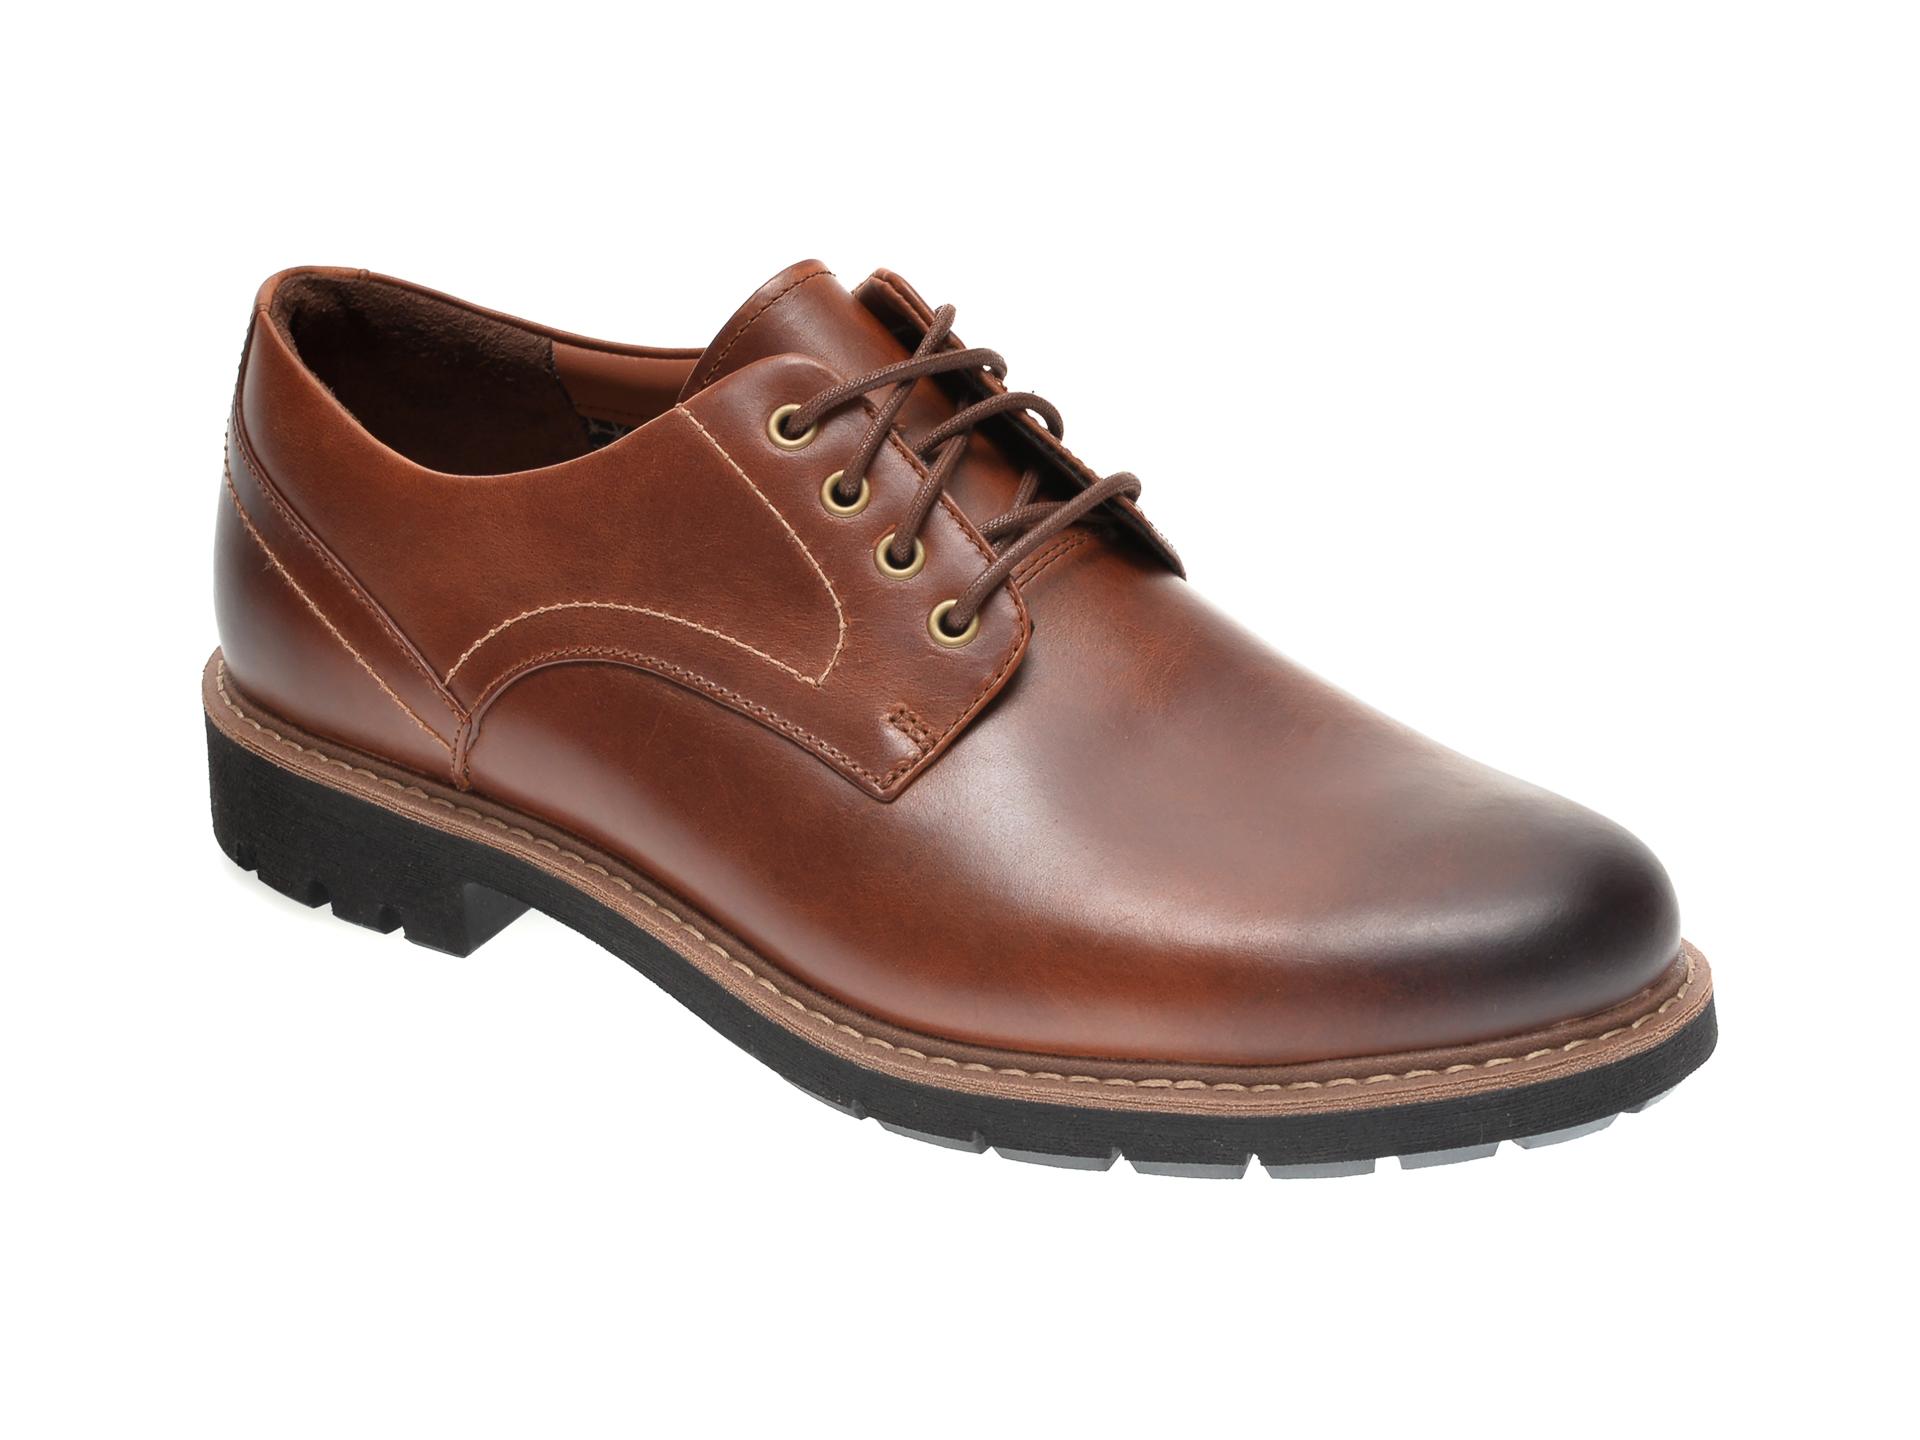 Pantofi CLARKS maro, BATCOMBE HALL, din piele naturala imagine